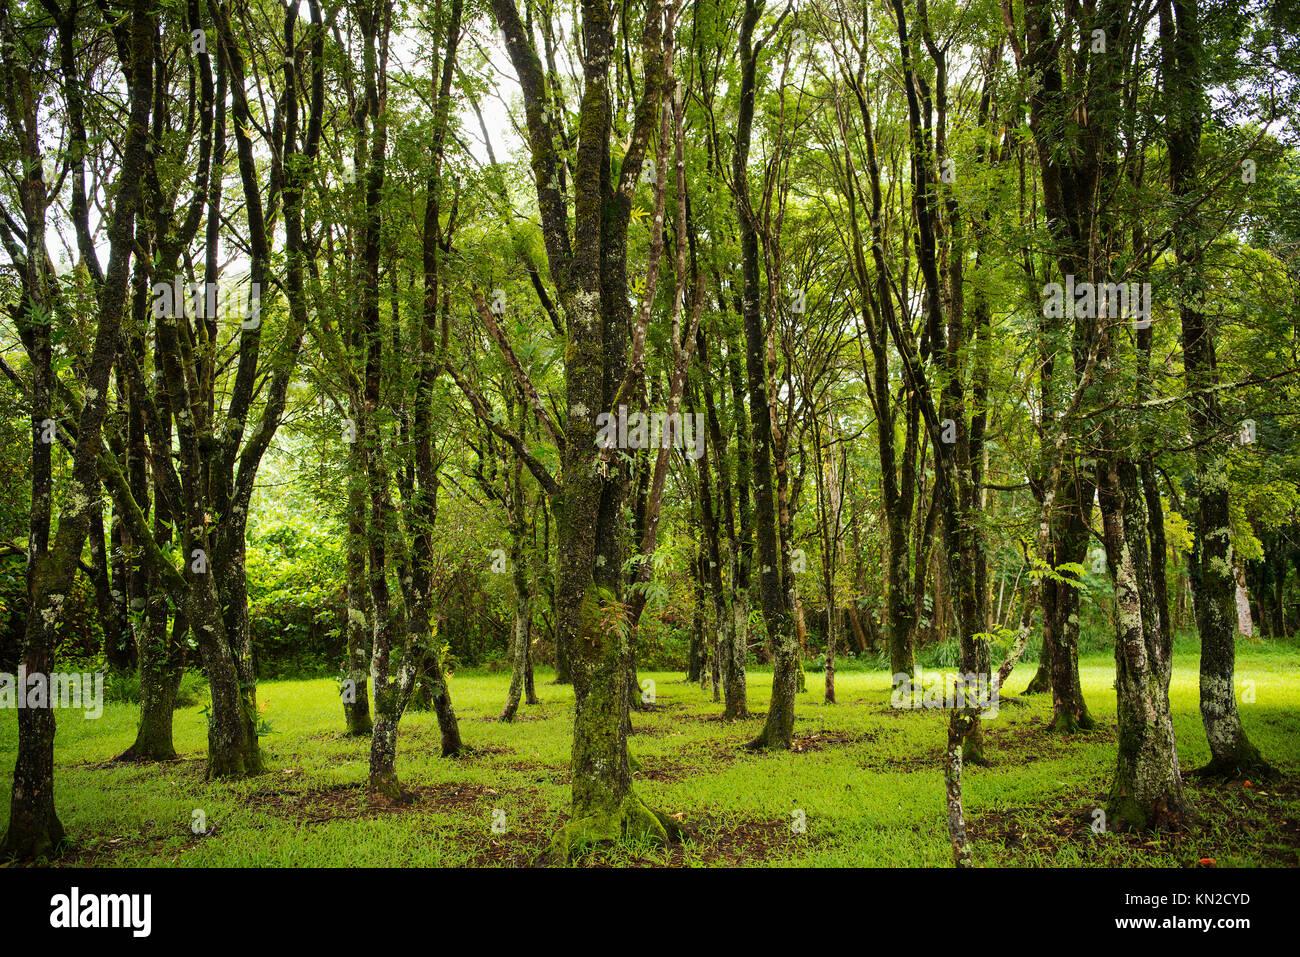 Mossy trees at Keahua Forestry Arboretum on Kaua'i Island, Hawai'i - Stock Image